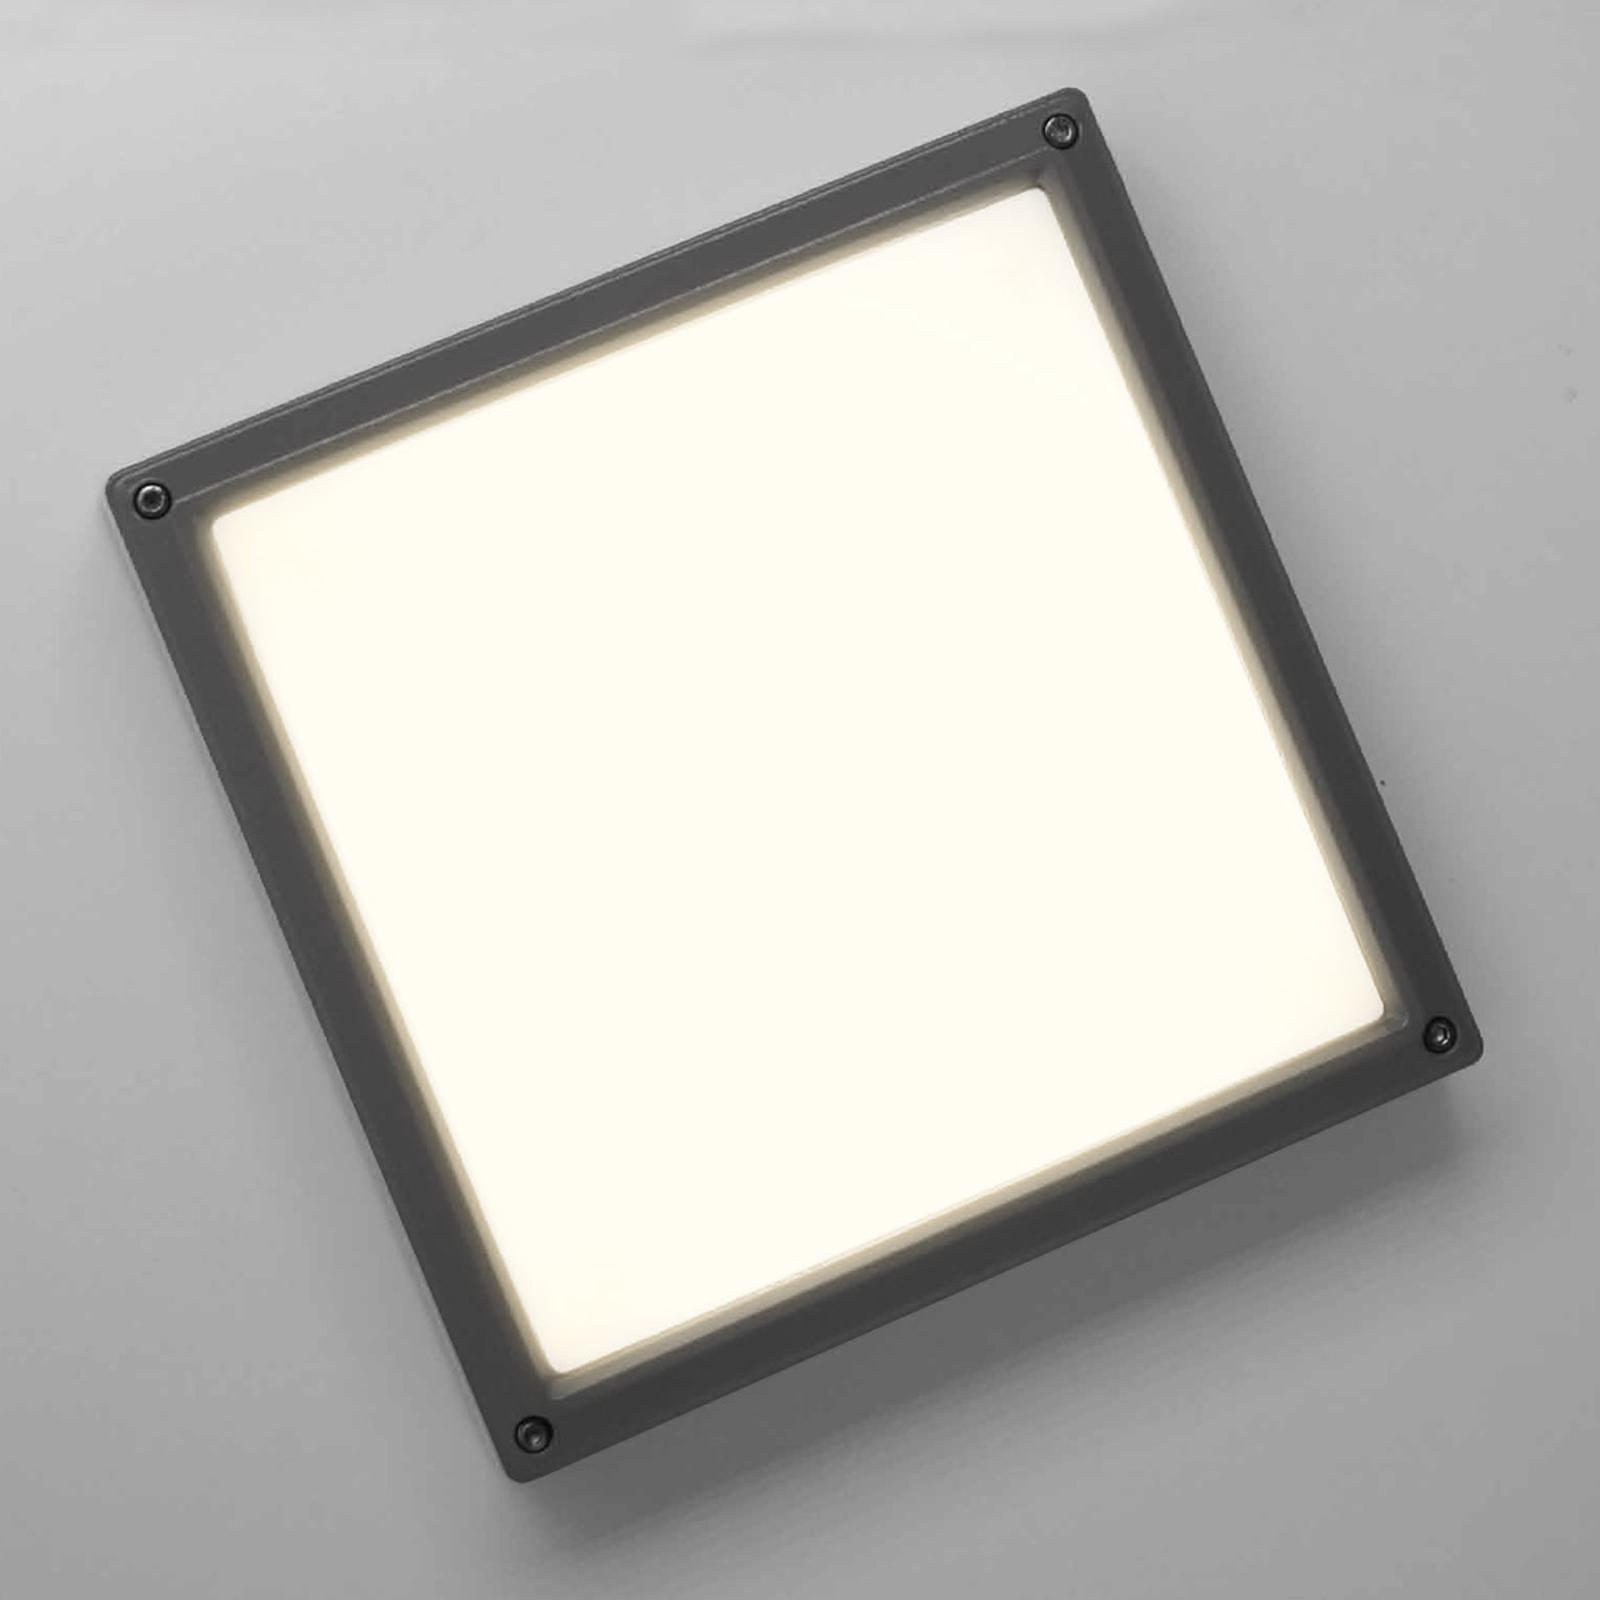 SUN 11 - applique LED 13W, antracite 3K